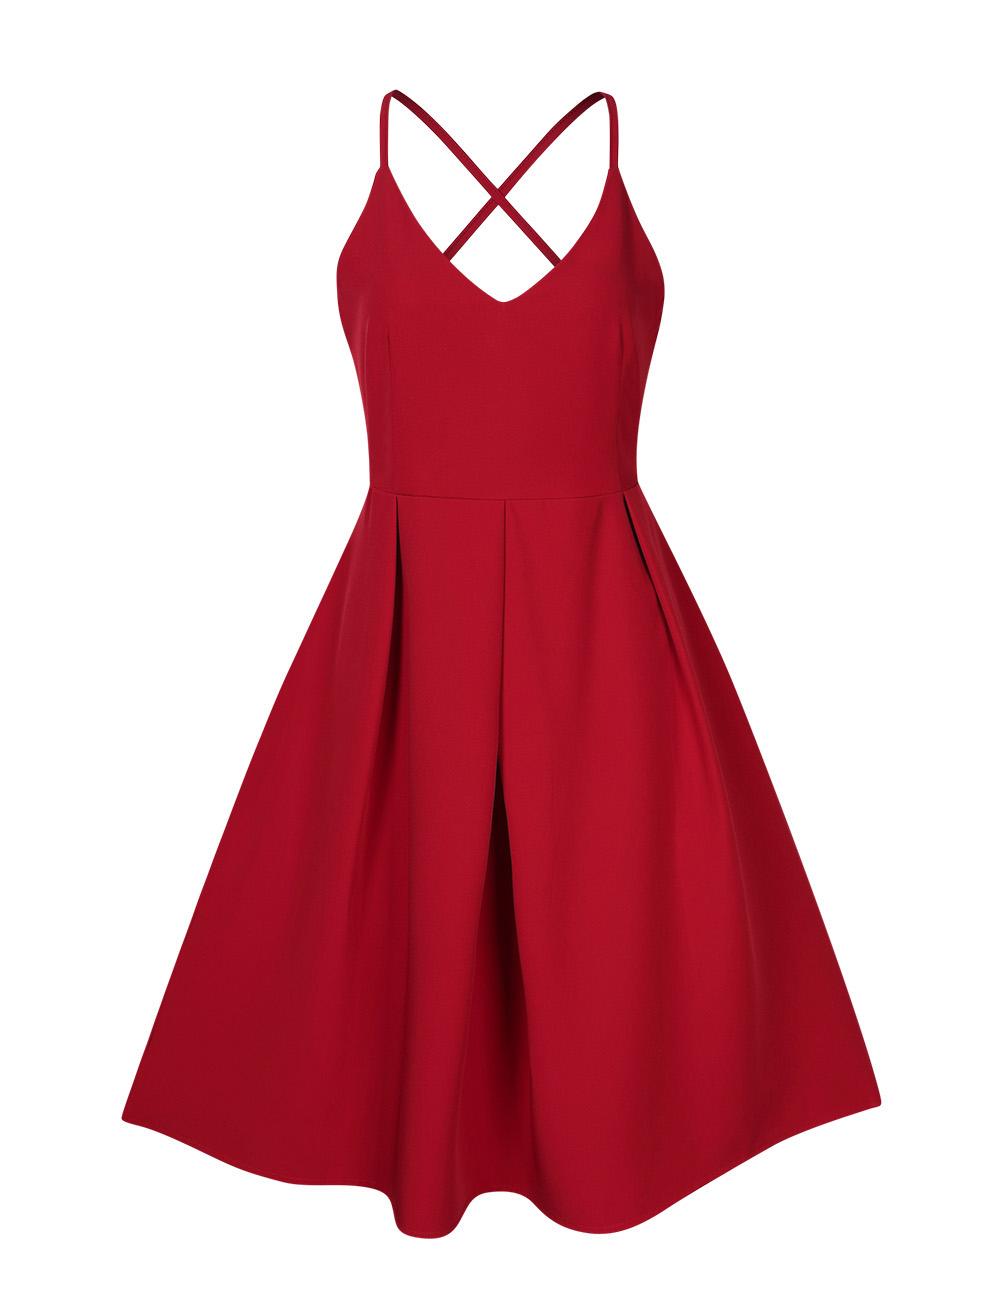 GlorySunshine Women Deep V-Neck Spaghetti Strap Dress Sleeveless Sexy Summer Cocktail Party Dresses Red_XL